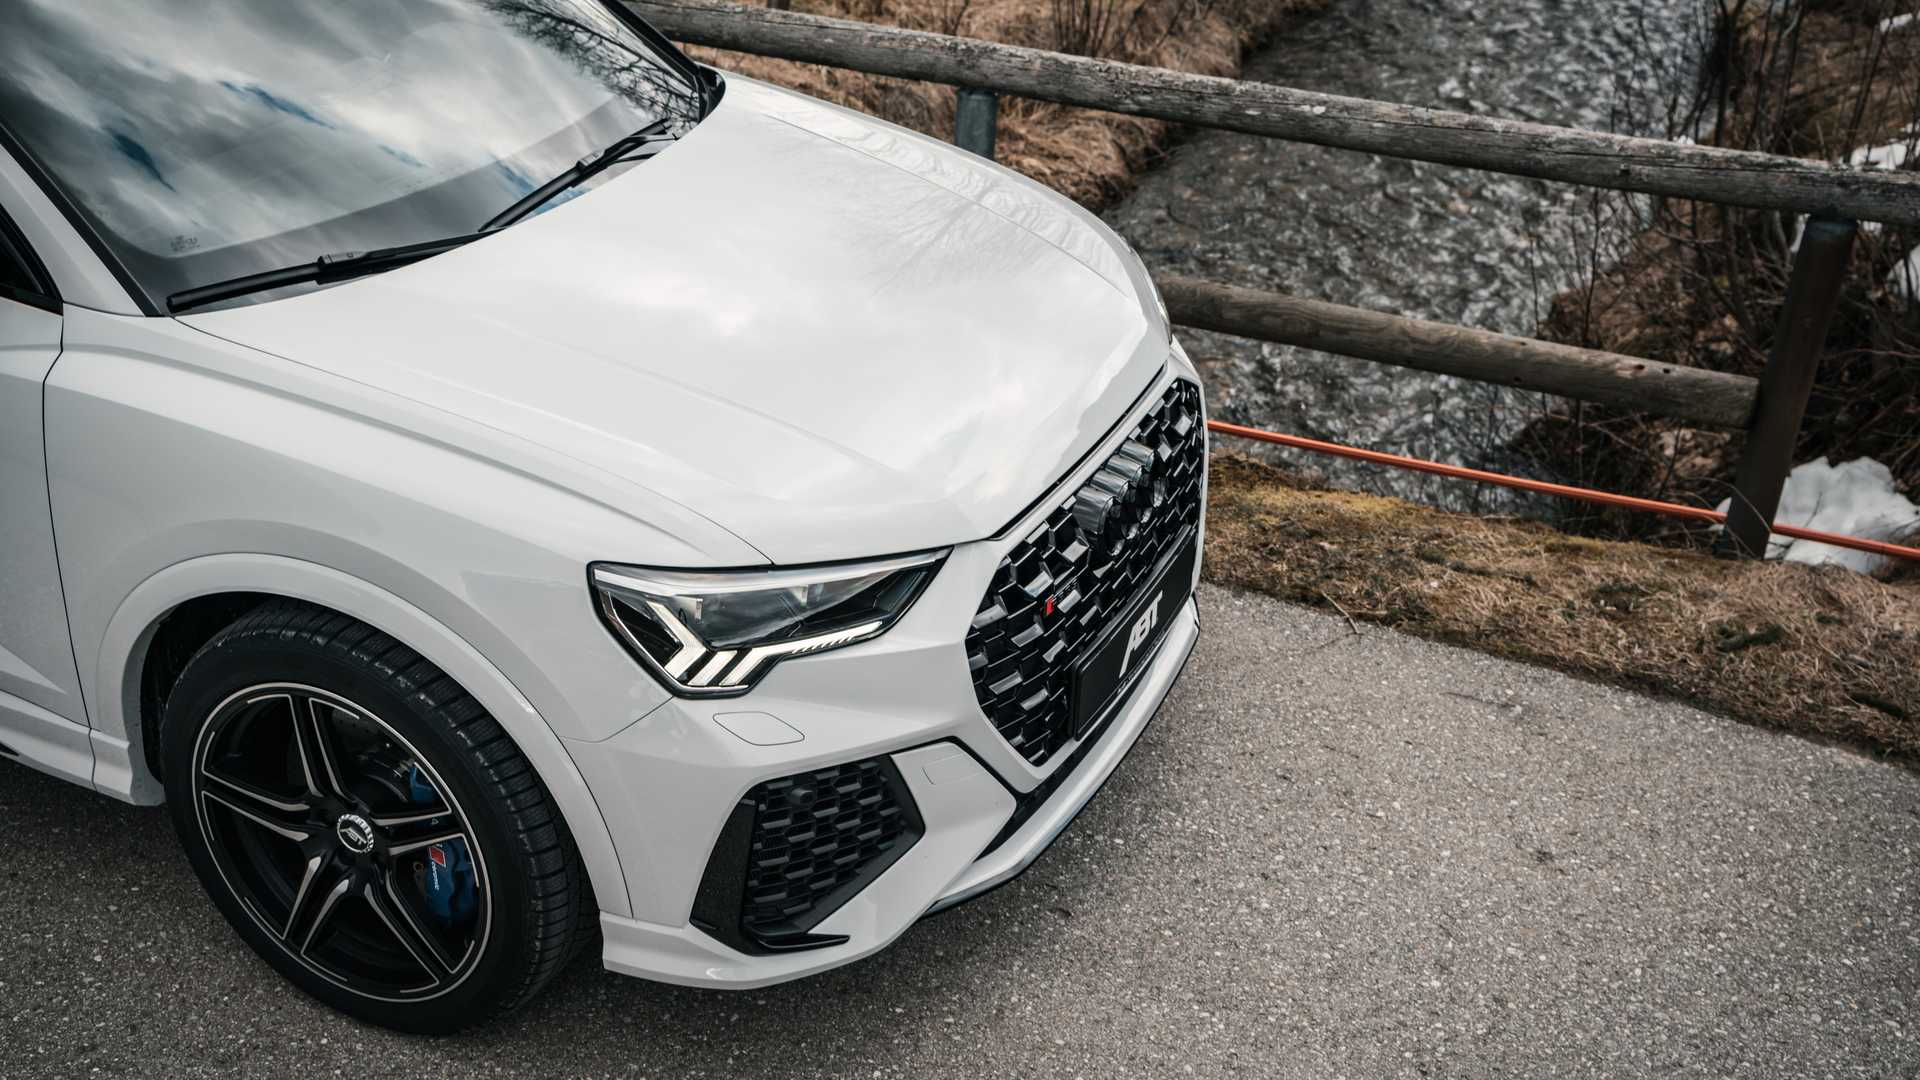 Audi-RS-Q3-Sportback-by-ABT-10